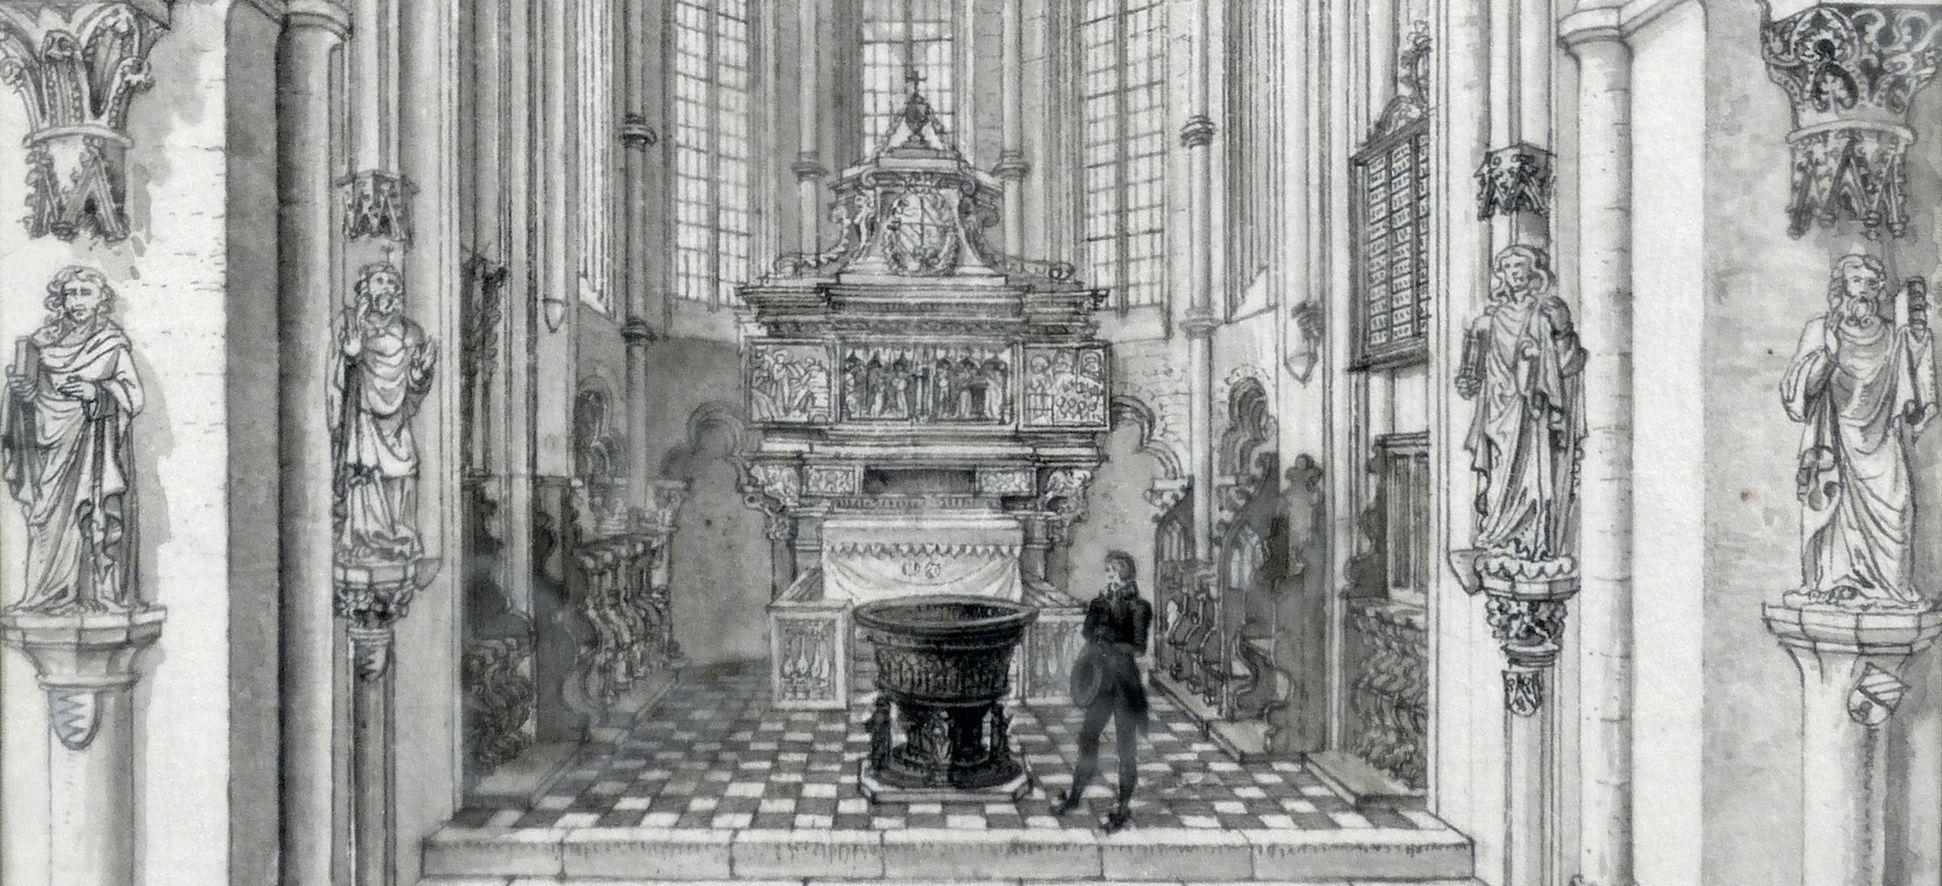 Das Innere der Sebaldskirche zu Nürnberg, Westchor unterer Bildausschnitt